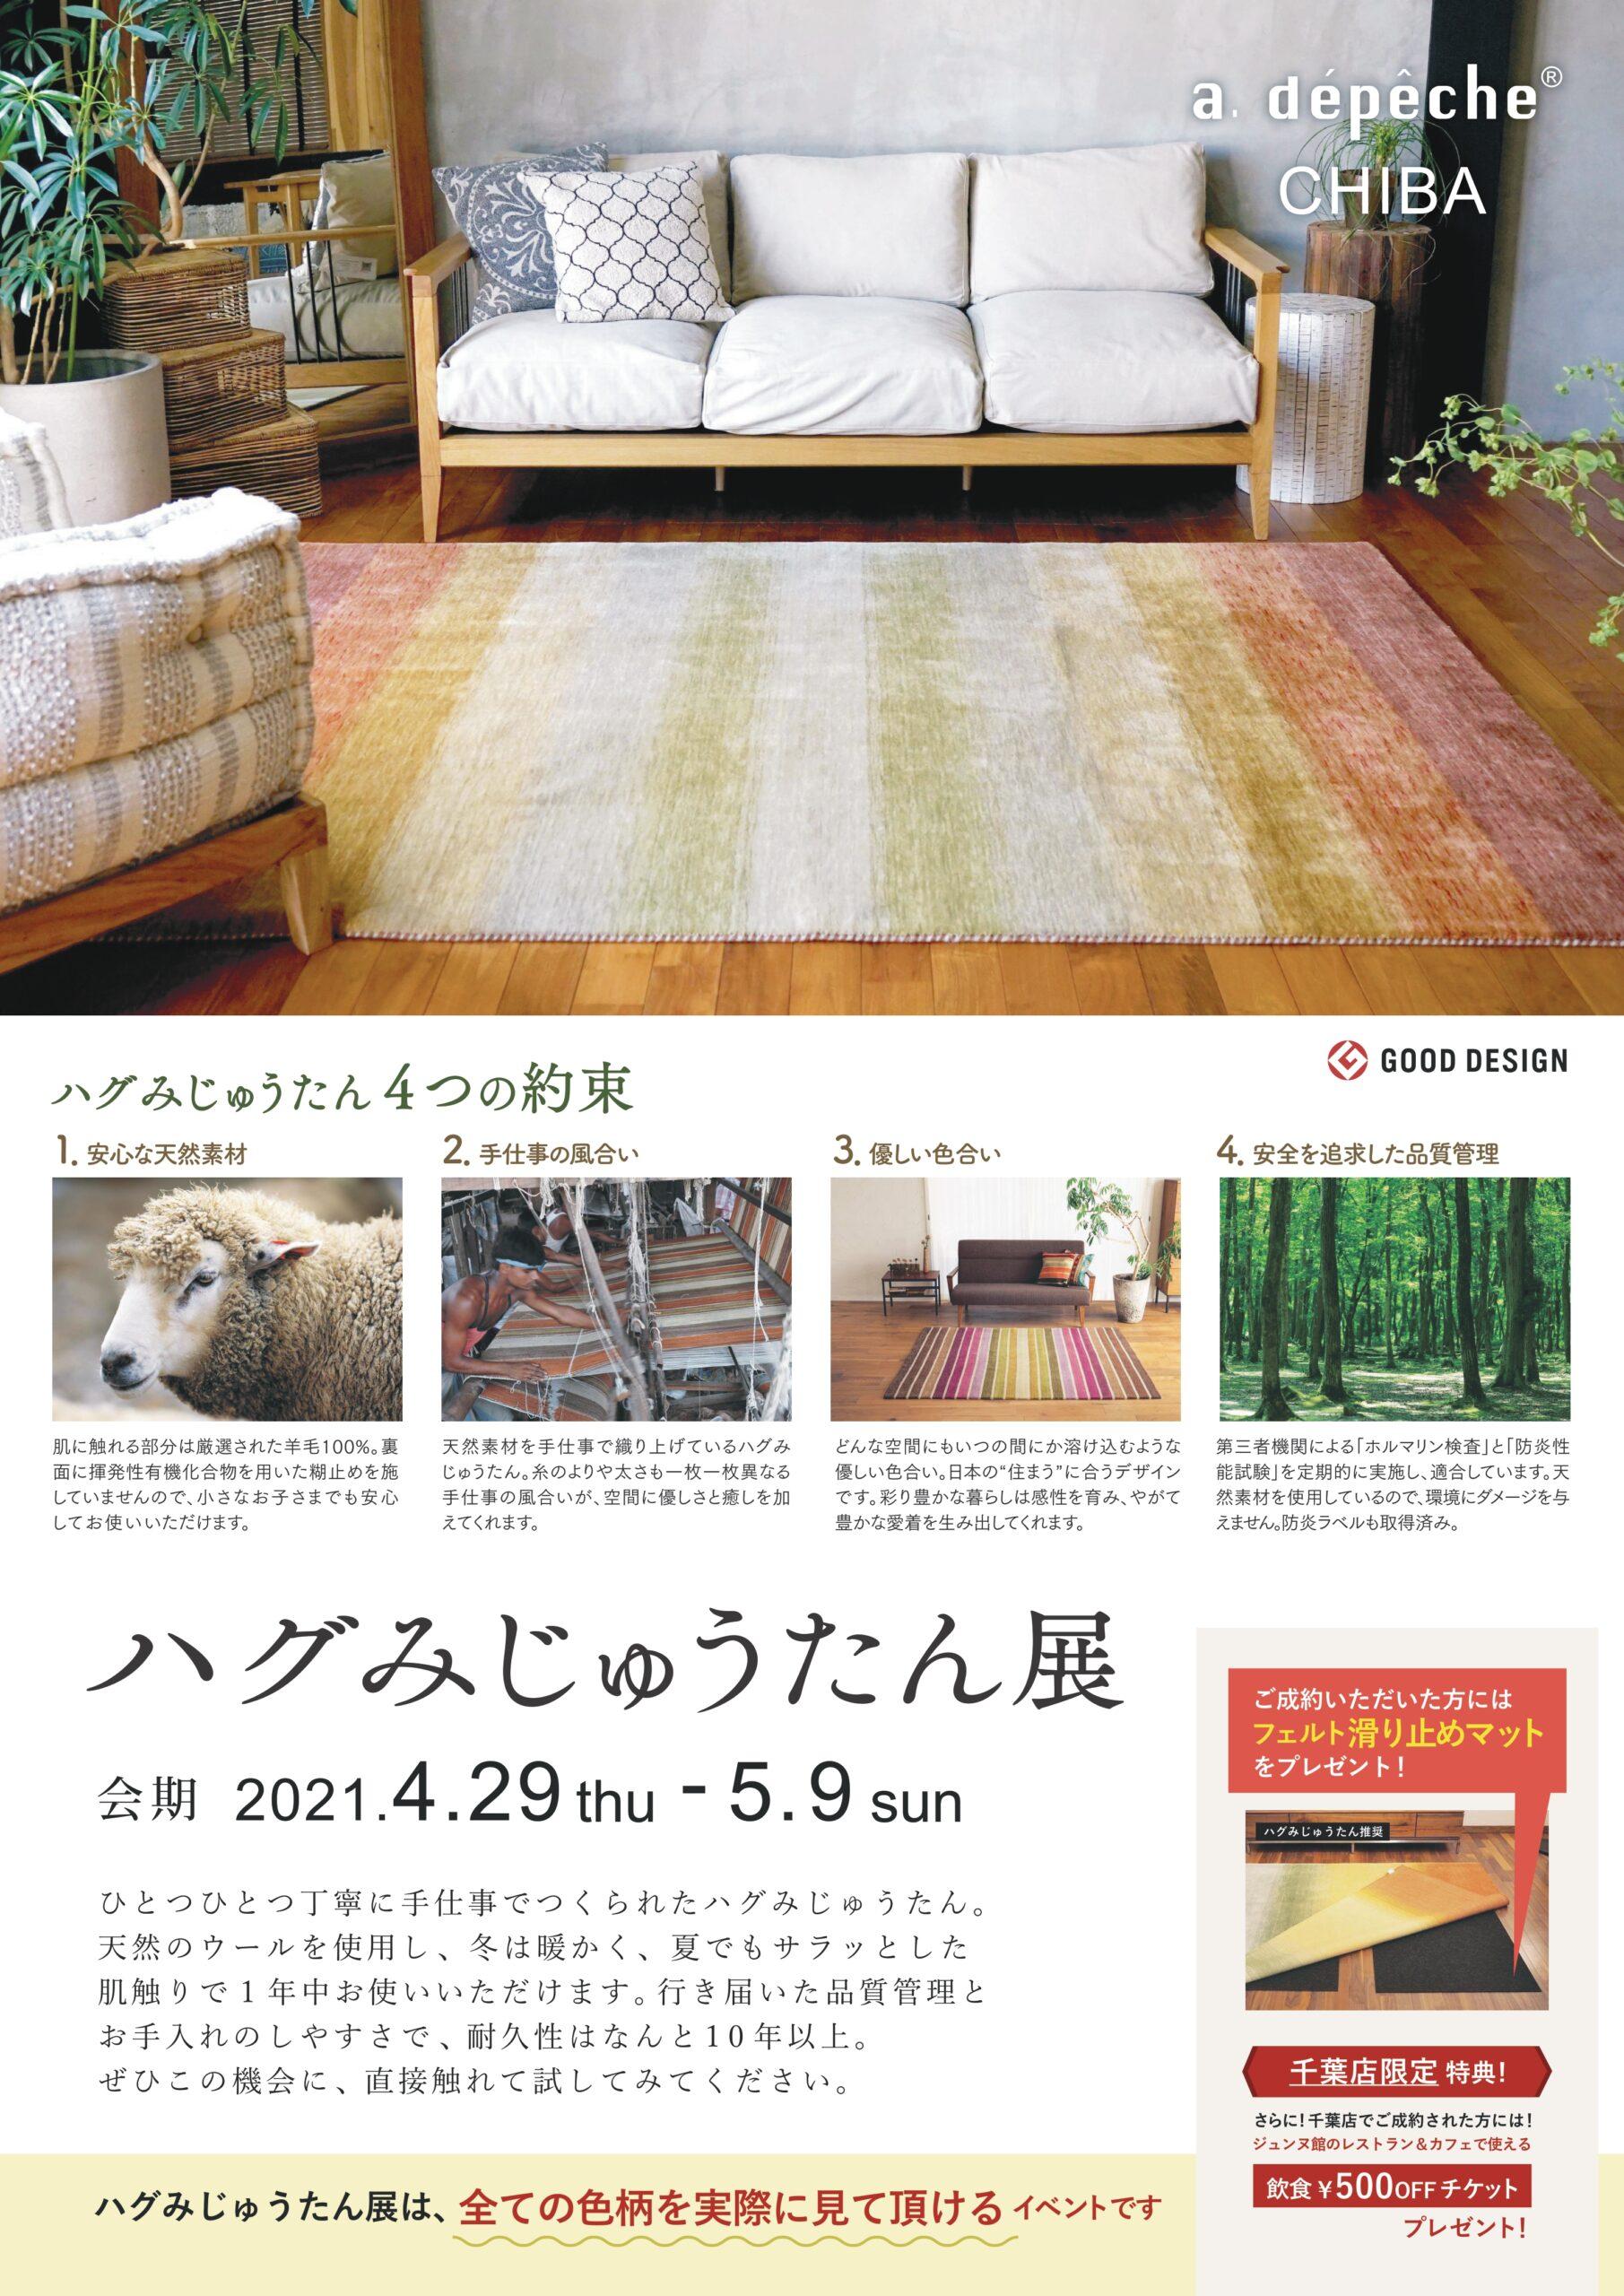 【a.depeche 千葉店】◆ハグみじゅうたん展◆のお知らせ